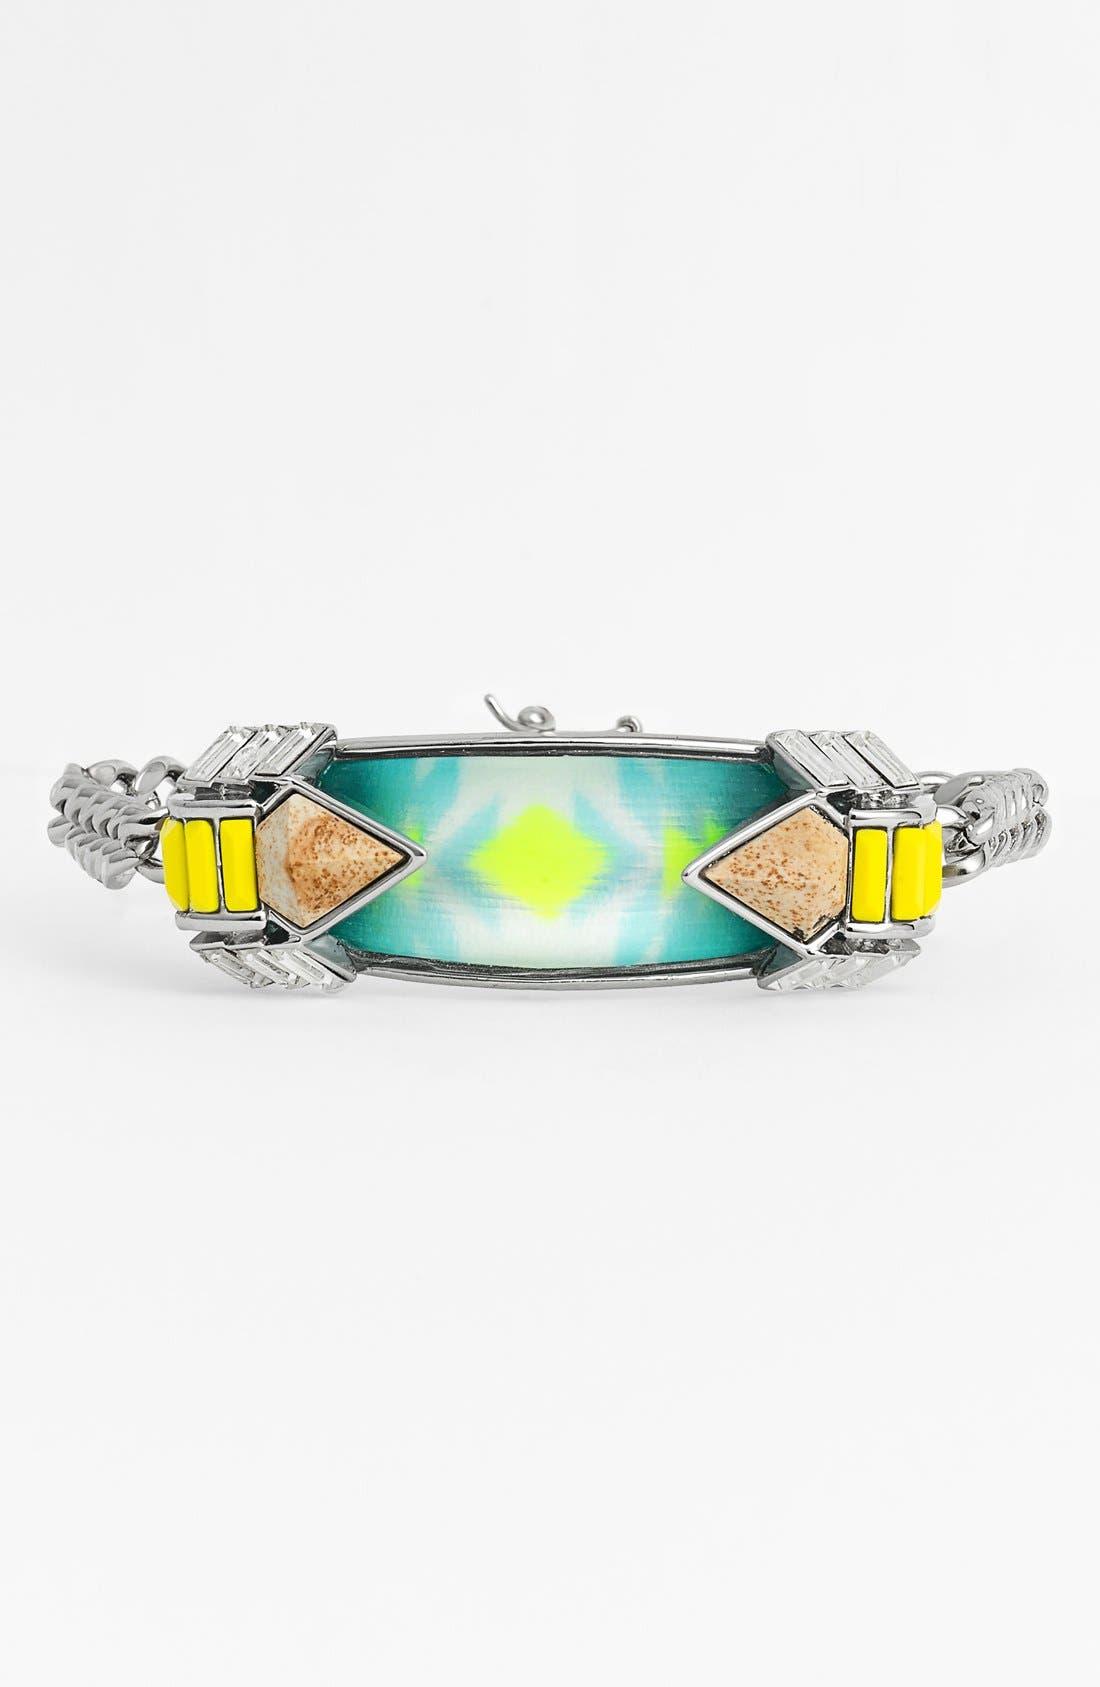 Main Image - Alexis Bittar 'Lucite® - Neon Deco' ID Bracelet